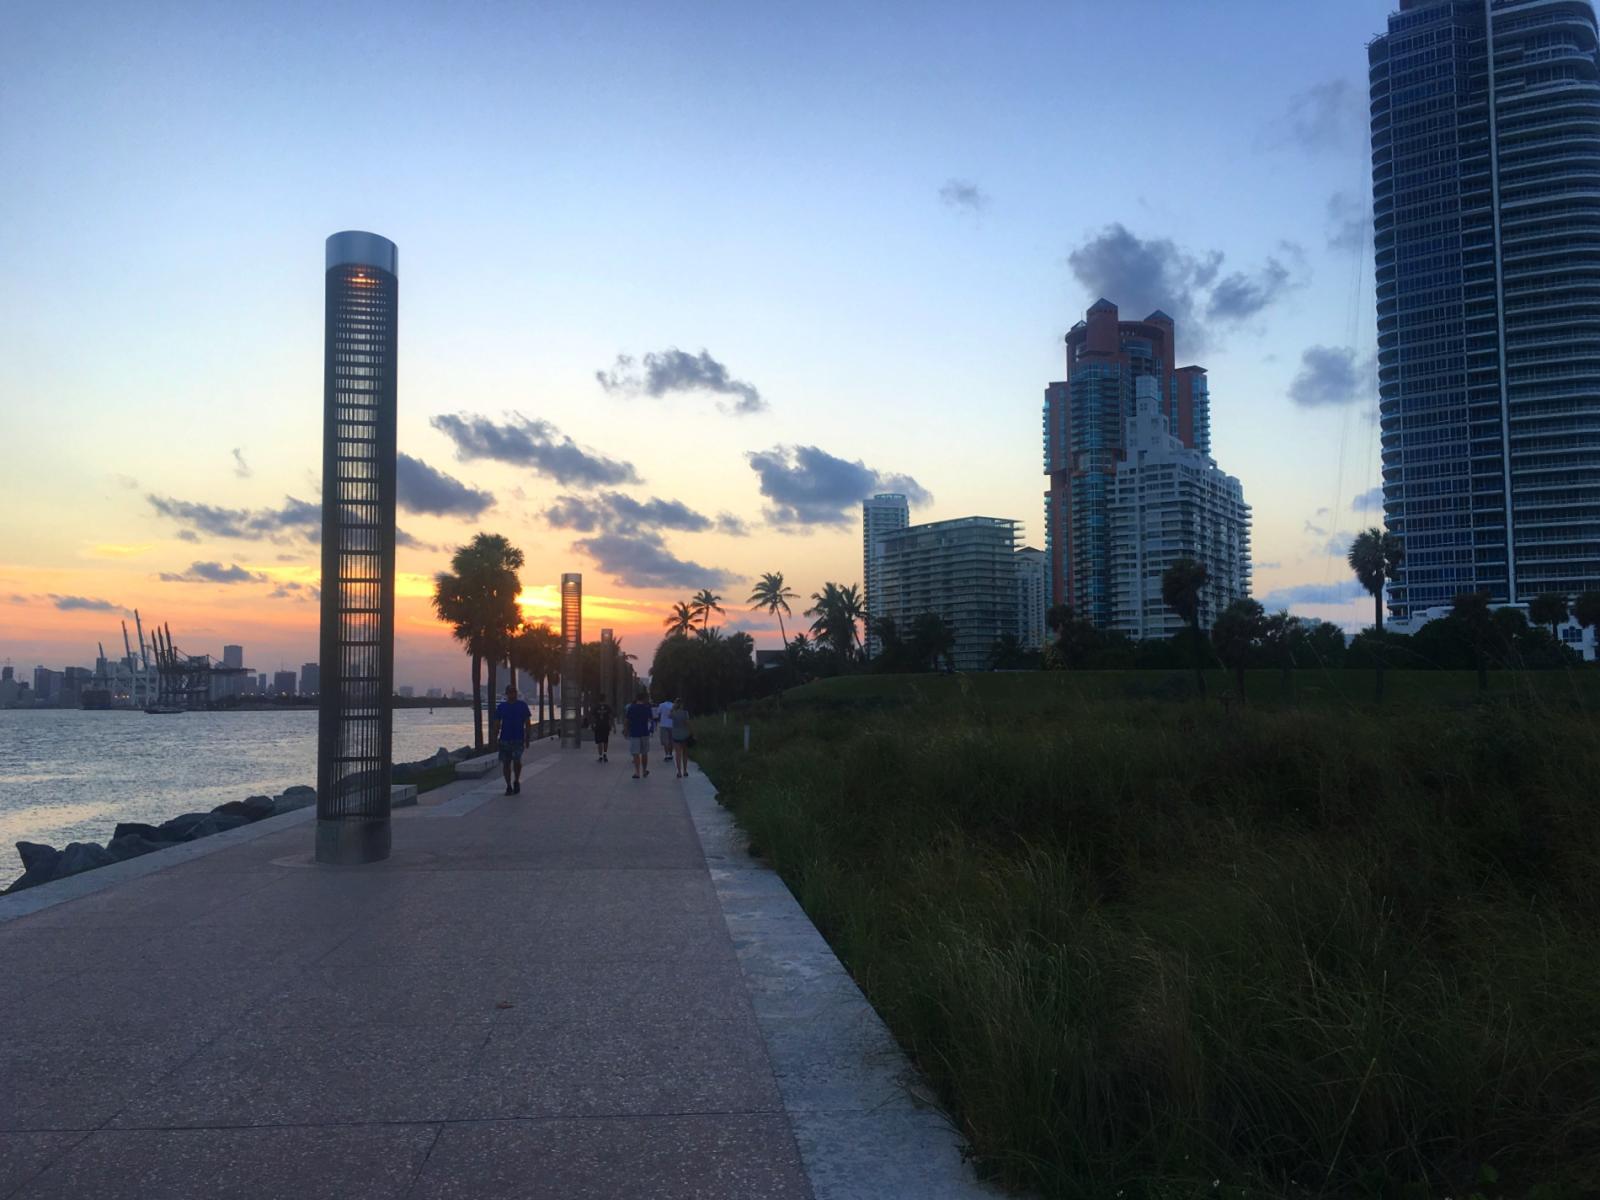 Que ver en Miami Beach: miami beach boardwalk